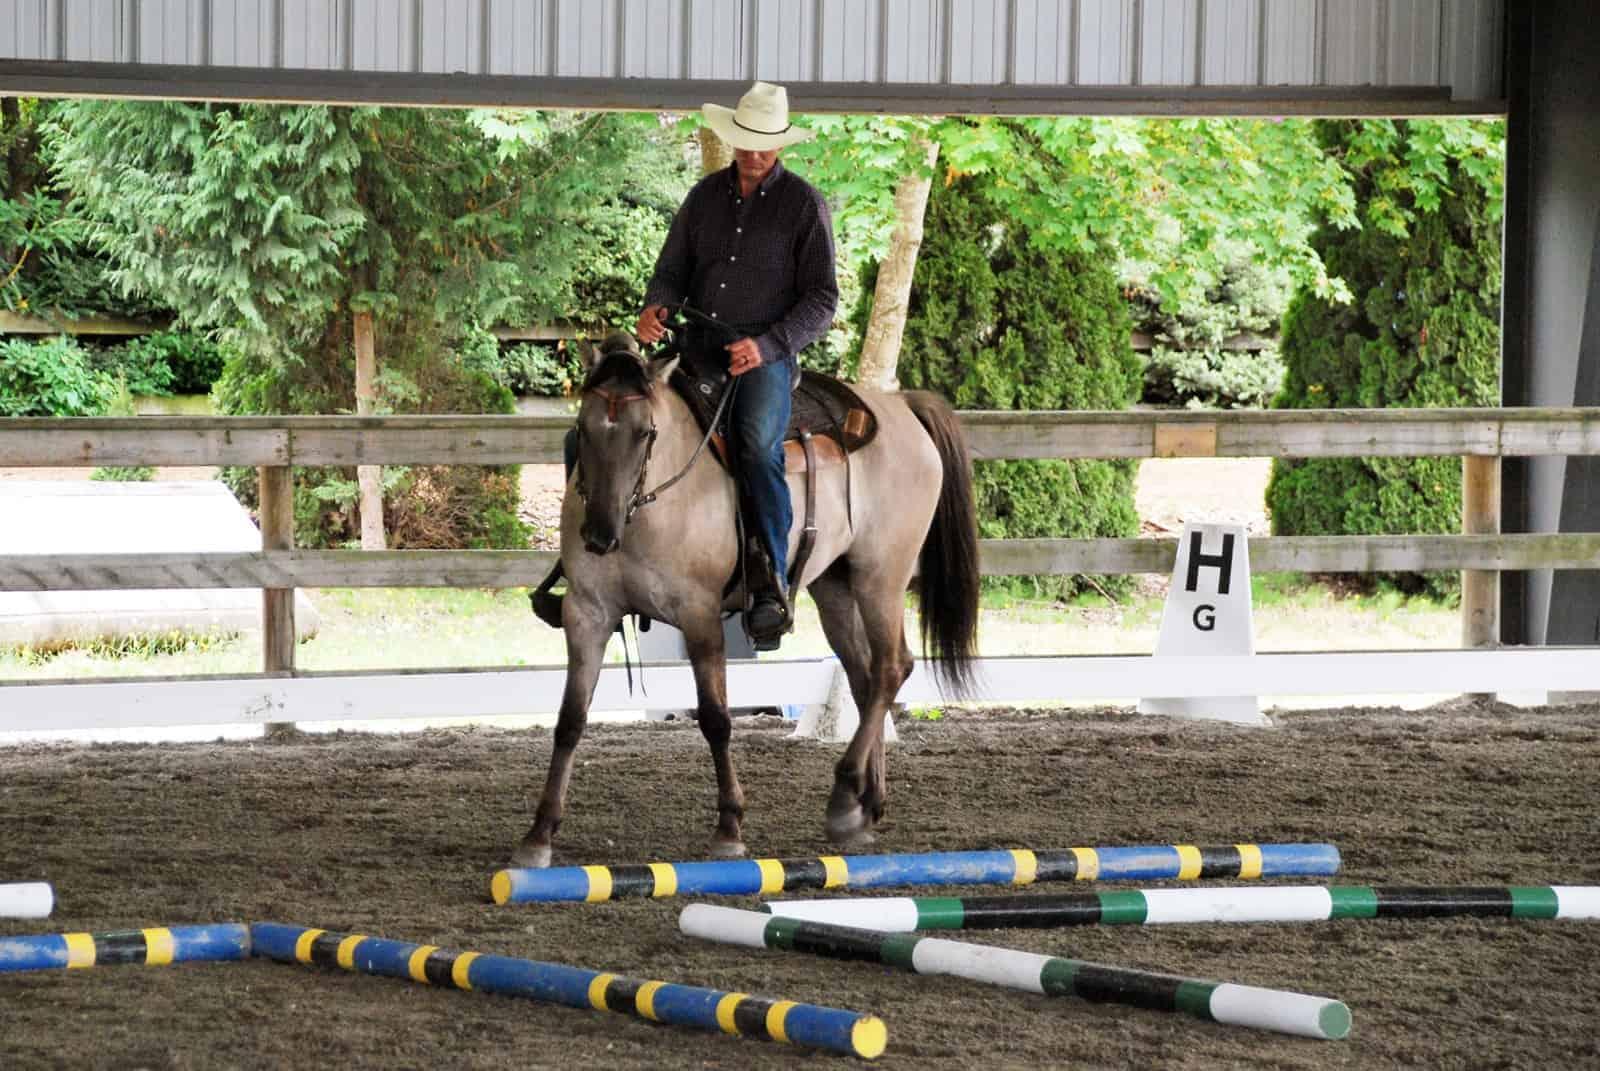 10 Learning Theory-Based Horse Training Principles